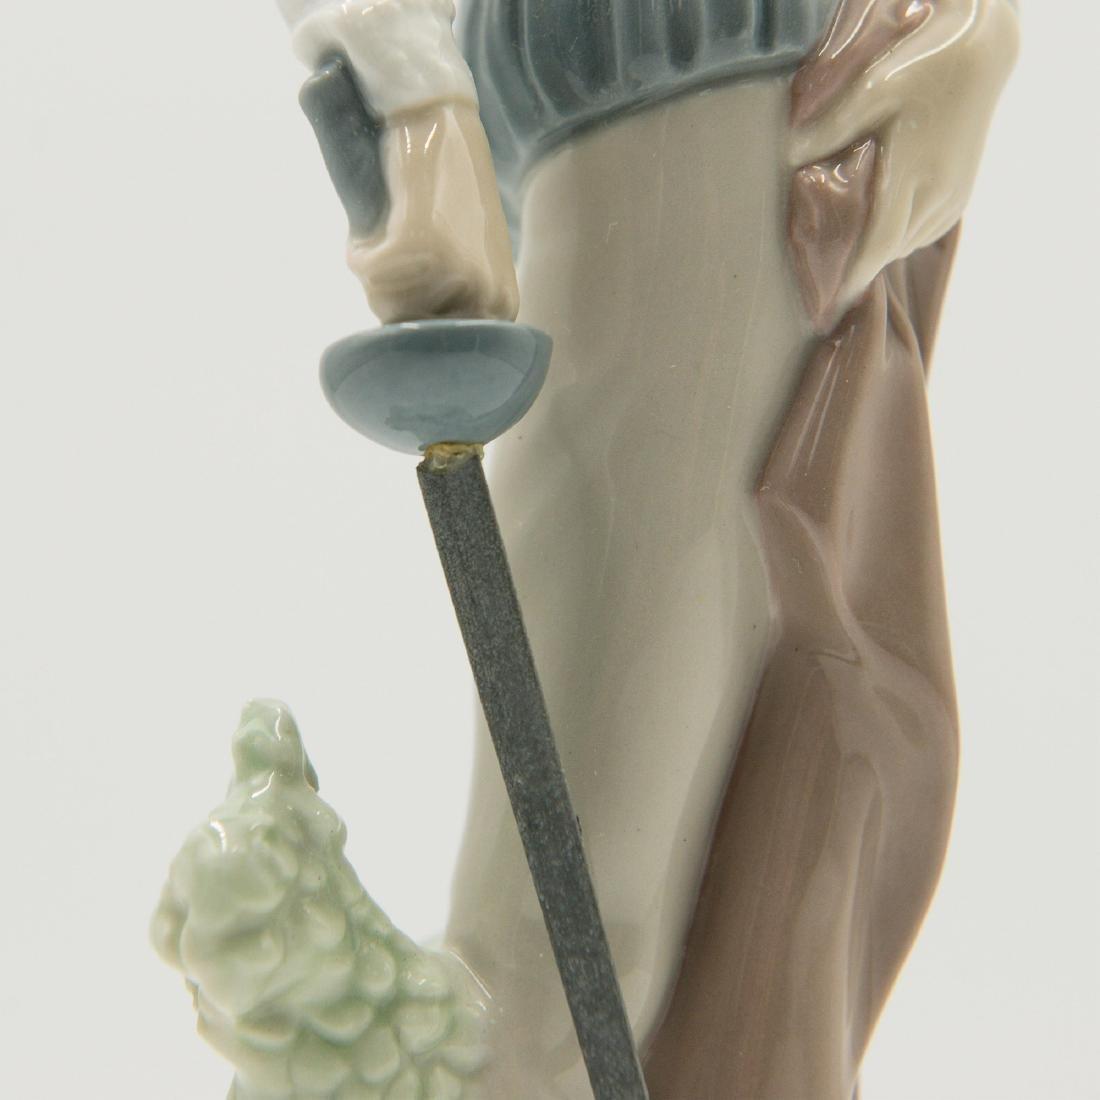 Lladro Quixote Standing Up Figure (4854) - 3